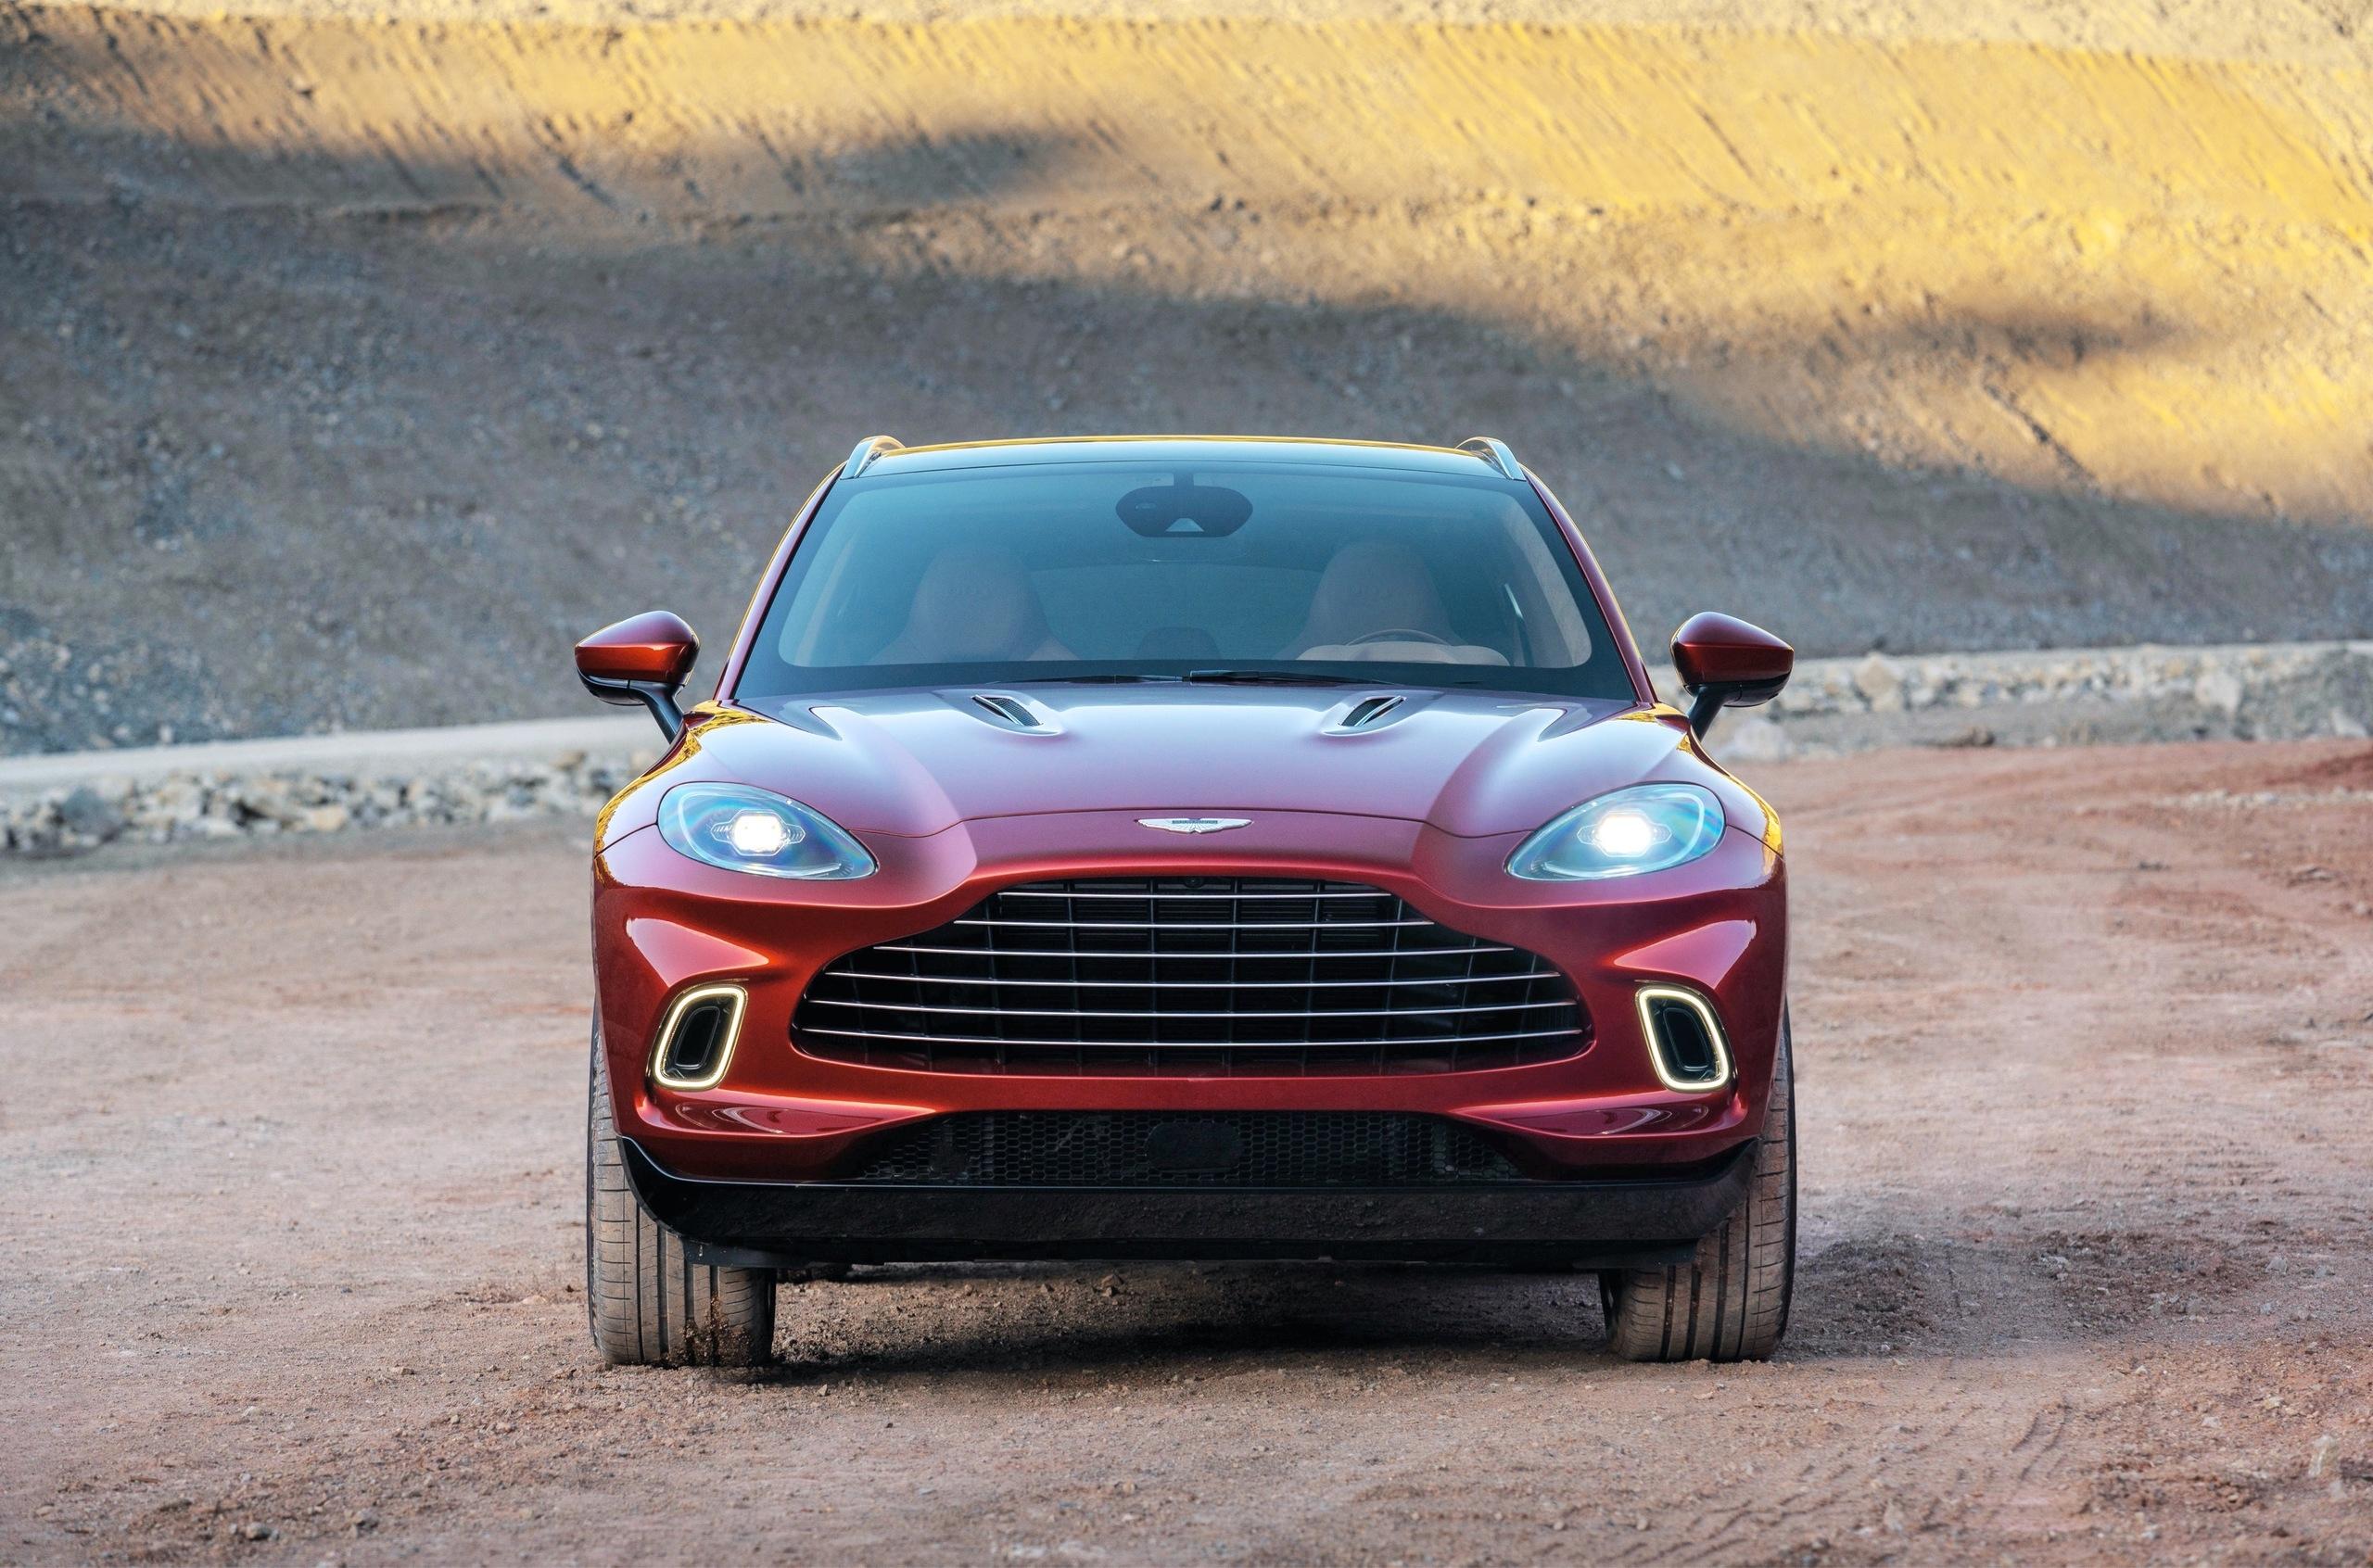 Обзор кроссовера Aston Martin DBX